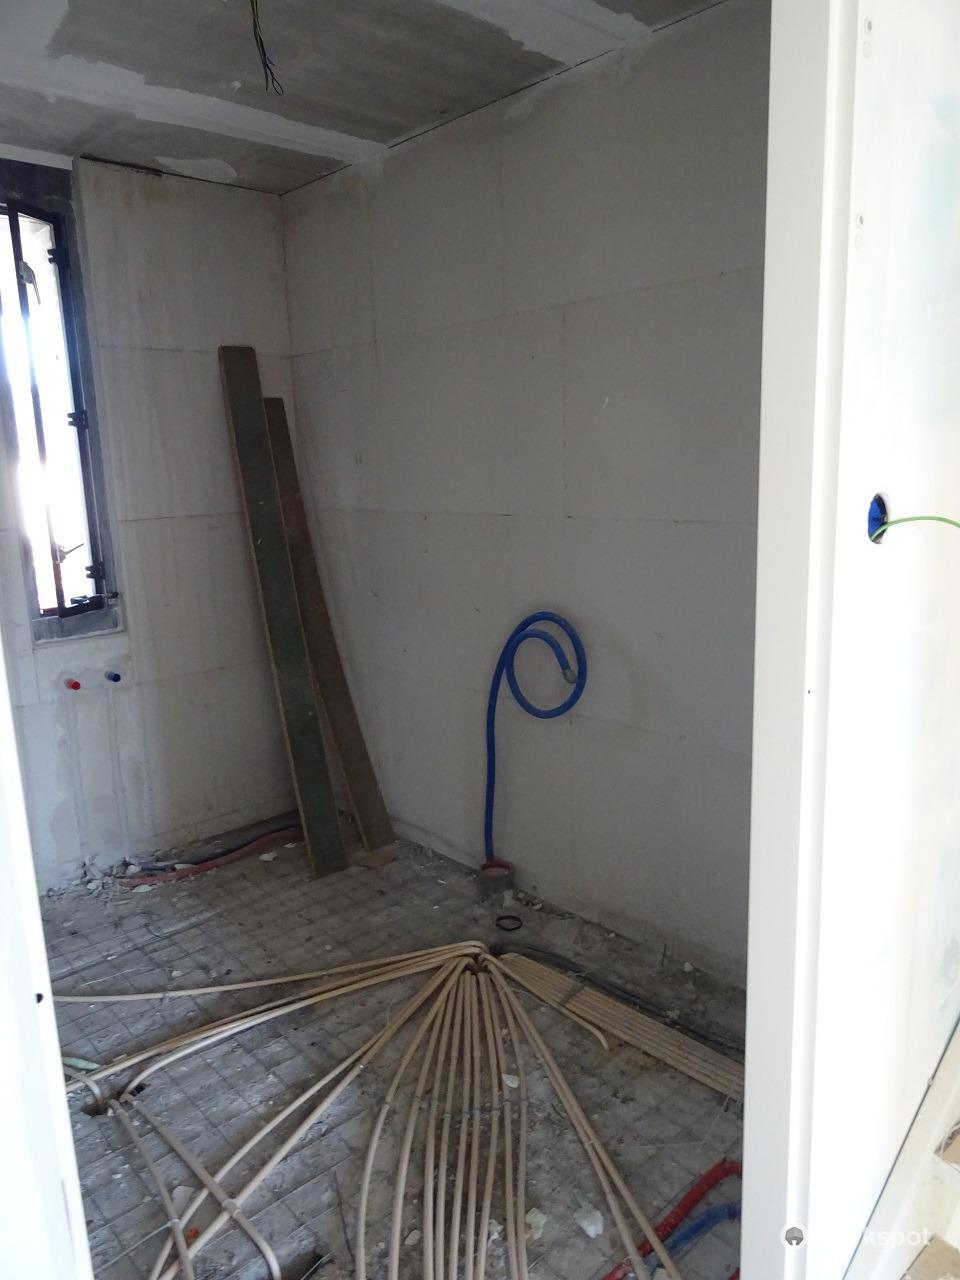 Badkamer & toilet opbouwen in casco nieuwbouwwoning - Werkspot